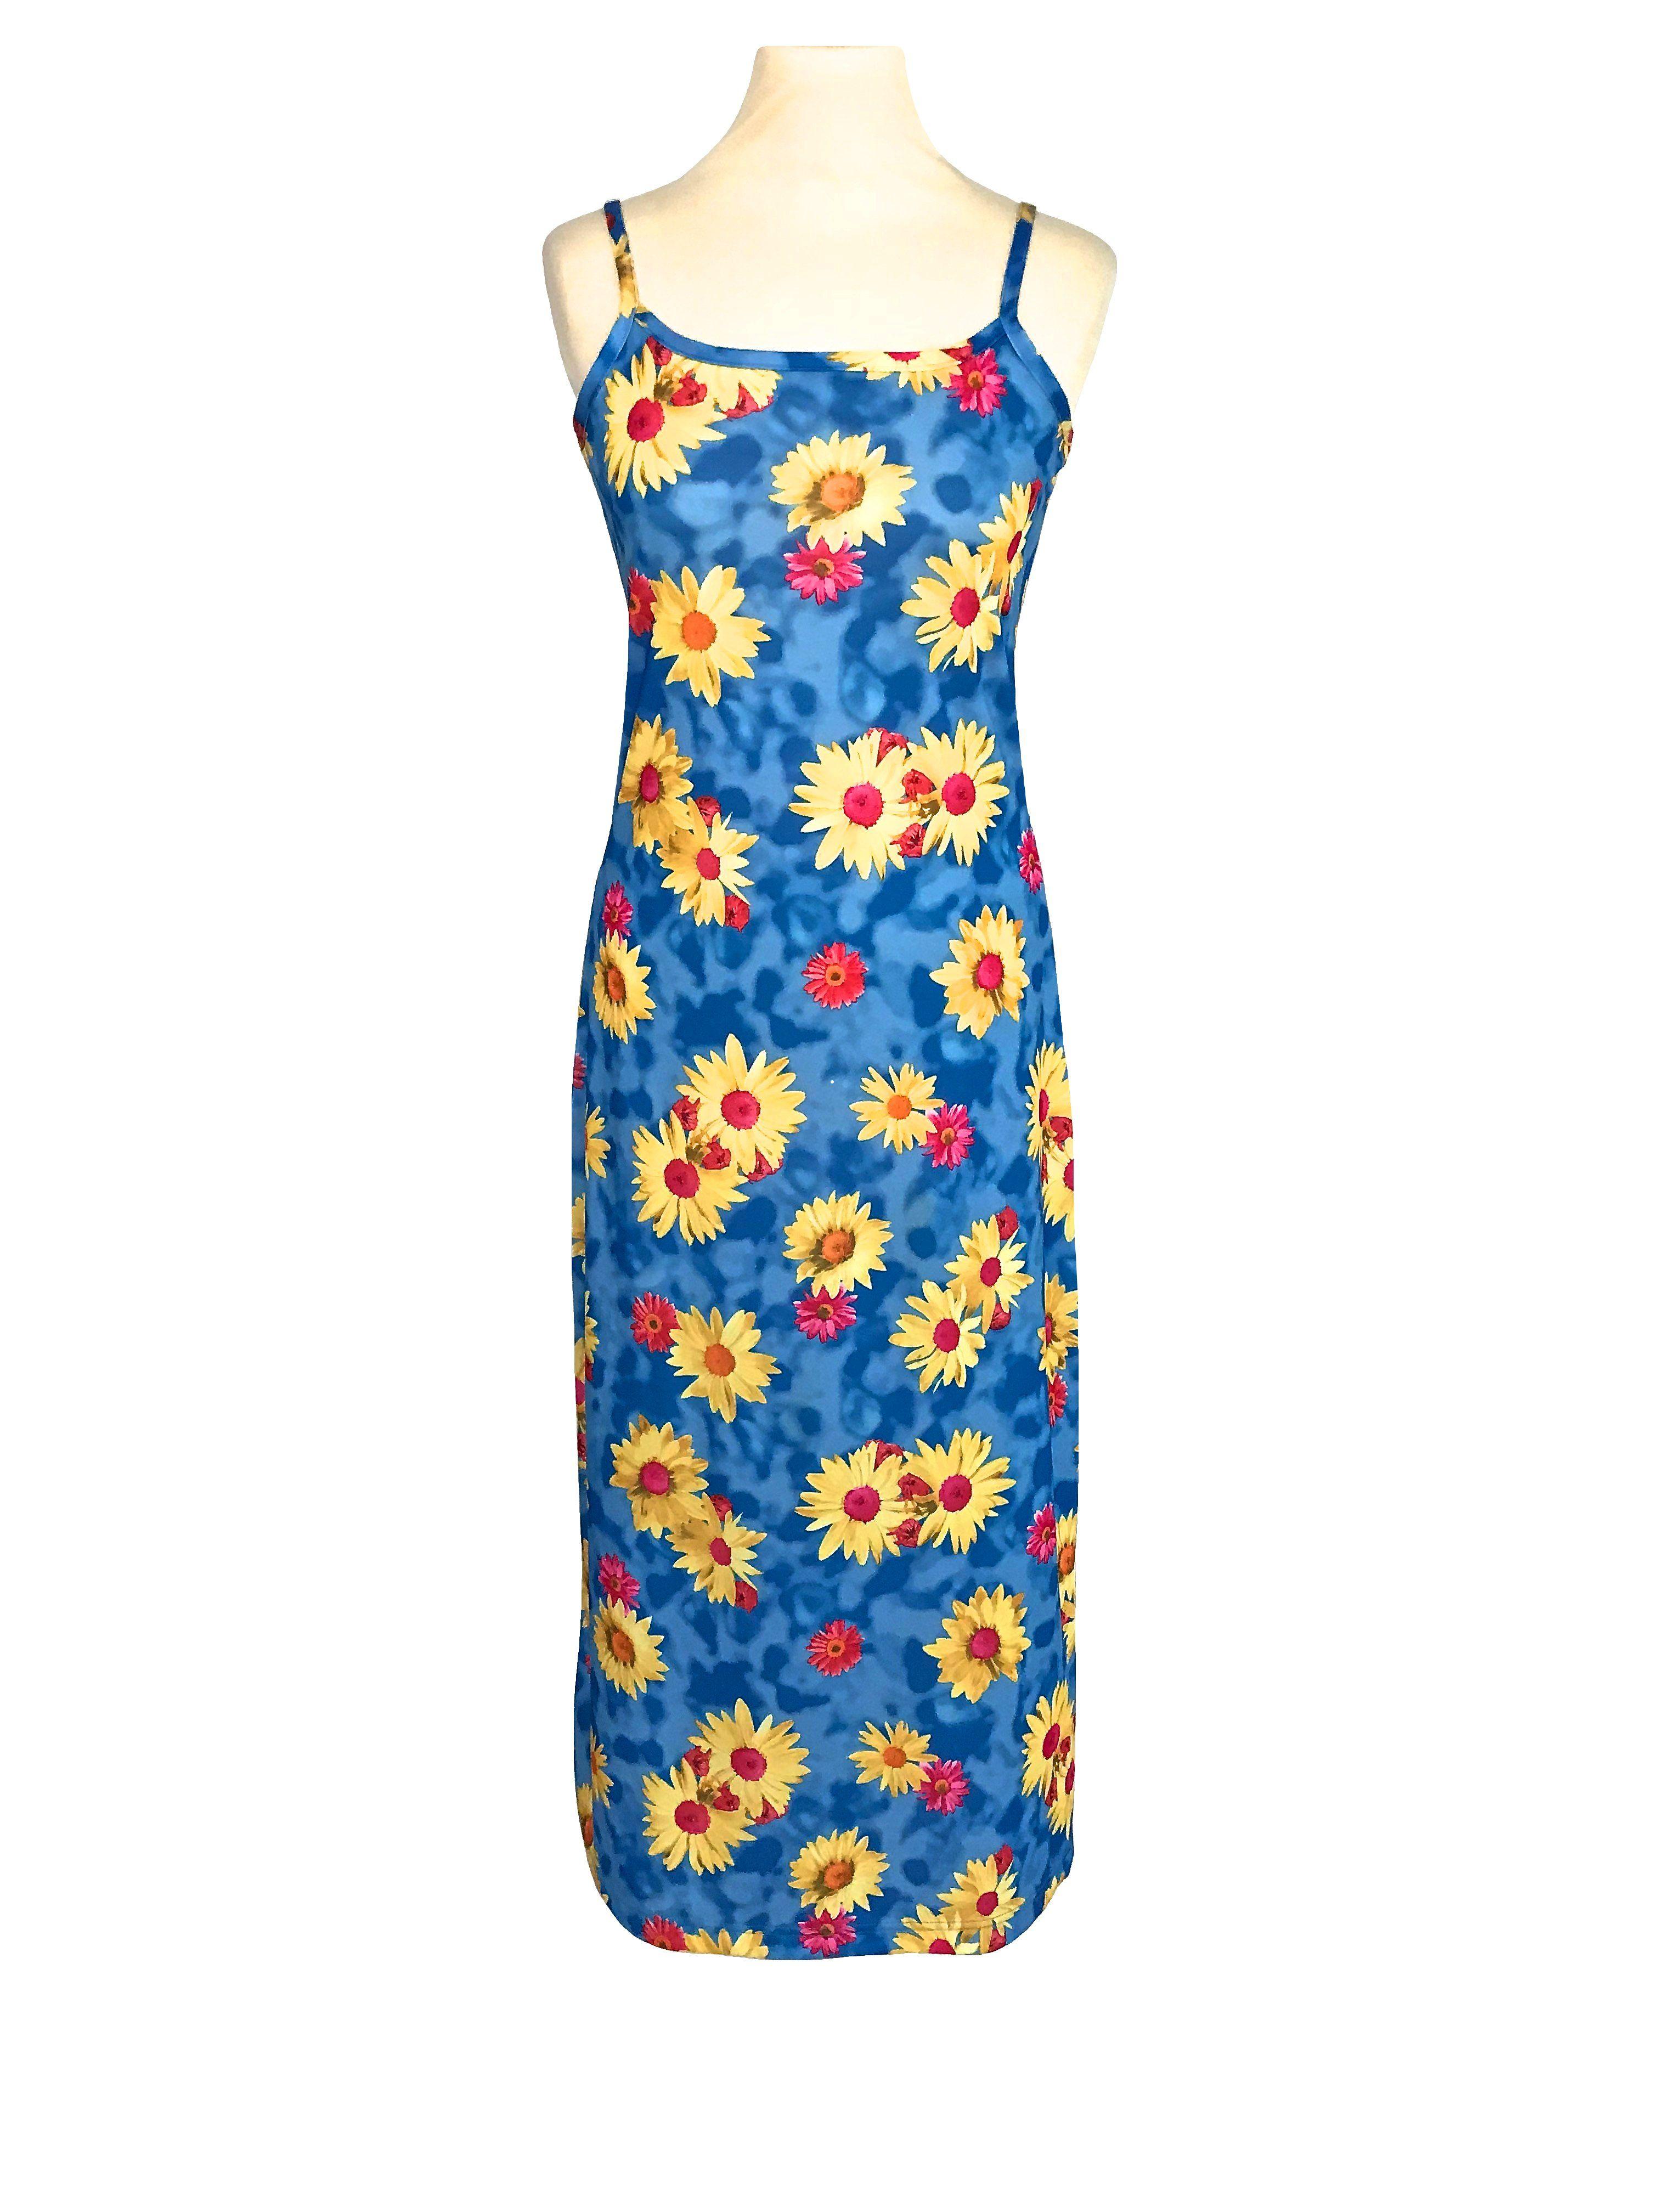 Floral Summer Dress 90s Sundress Grunge Mini Red Orange Floral Sun Rayon V Neck Tropical 1990s Bohemian Vintage Shift Boho Sleeveless Medium